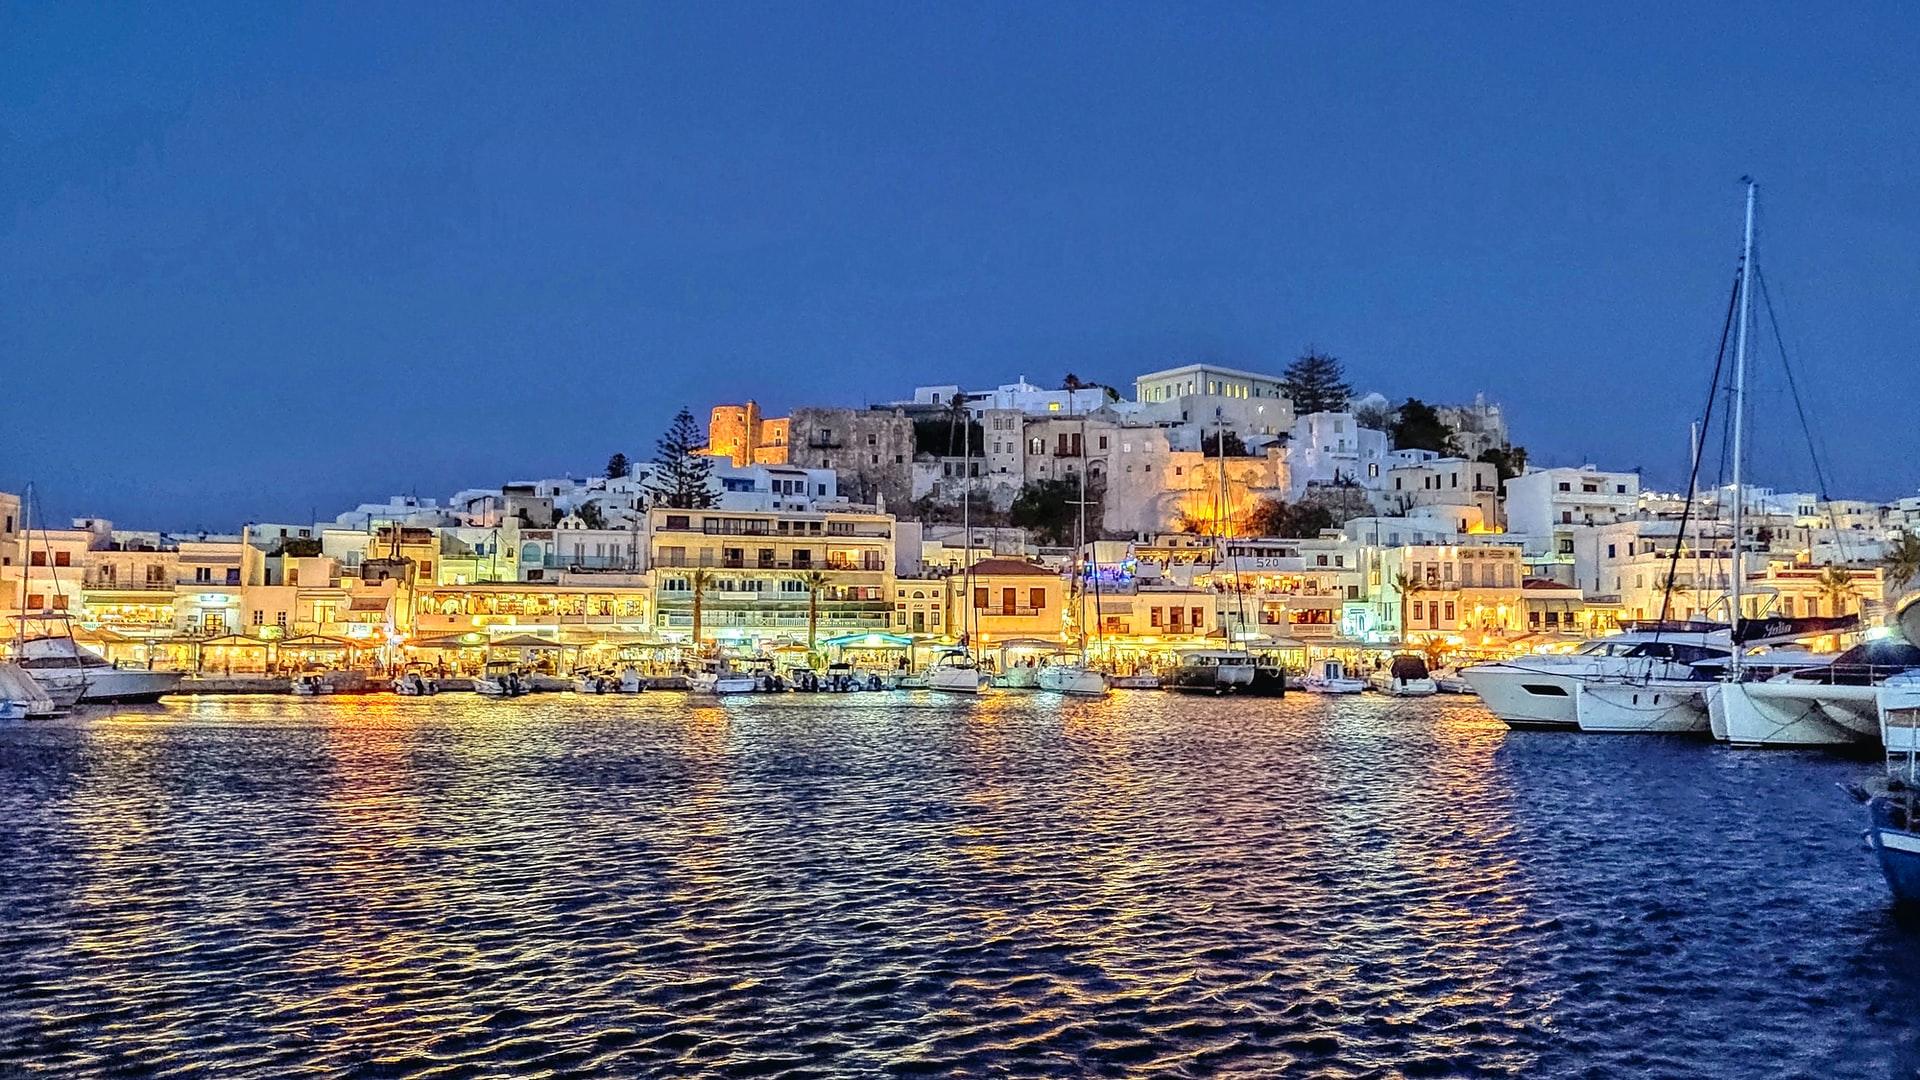 8 Reasons You Should Visit The Greek Islands